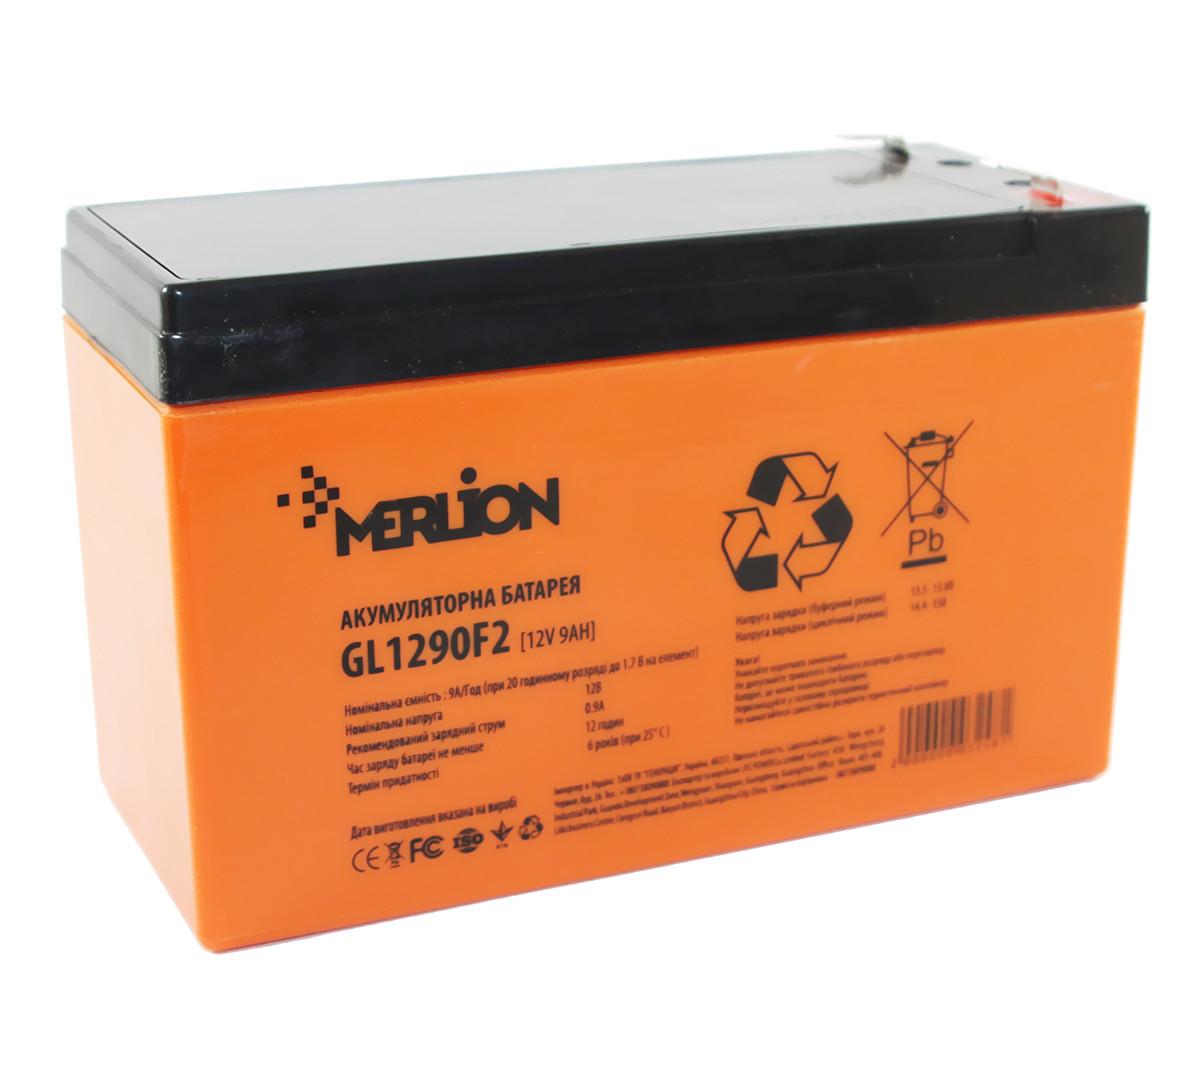 Аккумулятор для ИБП 12В 9Ач Merlion, GL1290F2, ШхДхВ 65х150х95